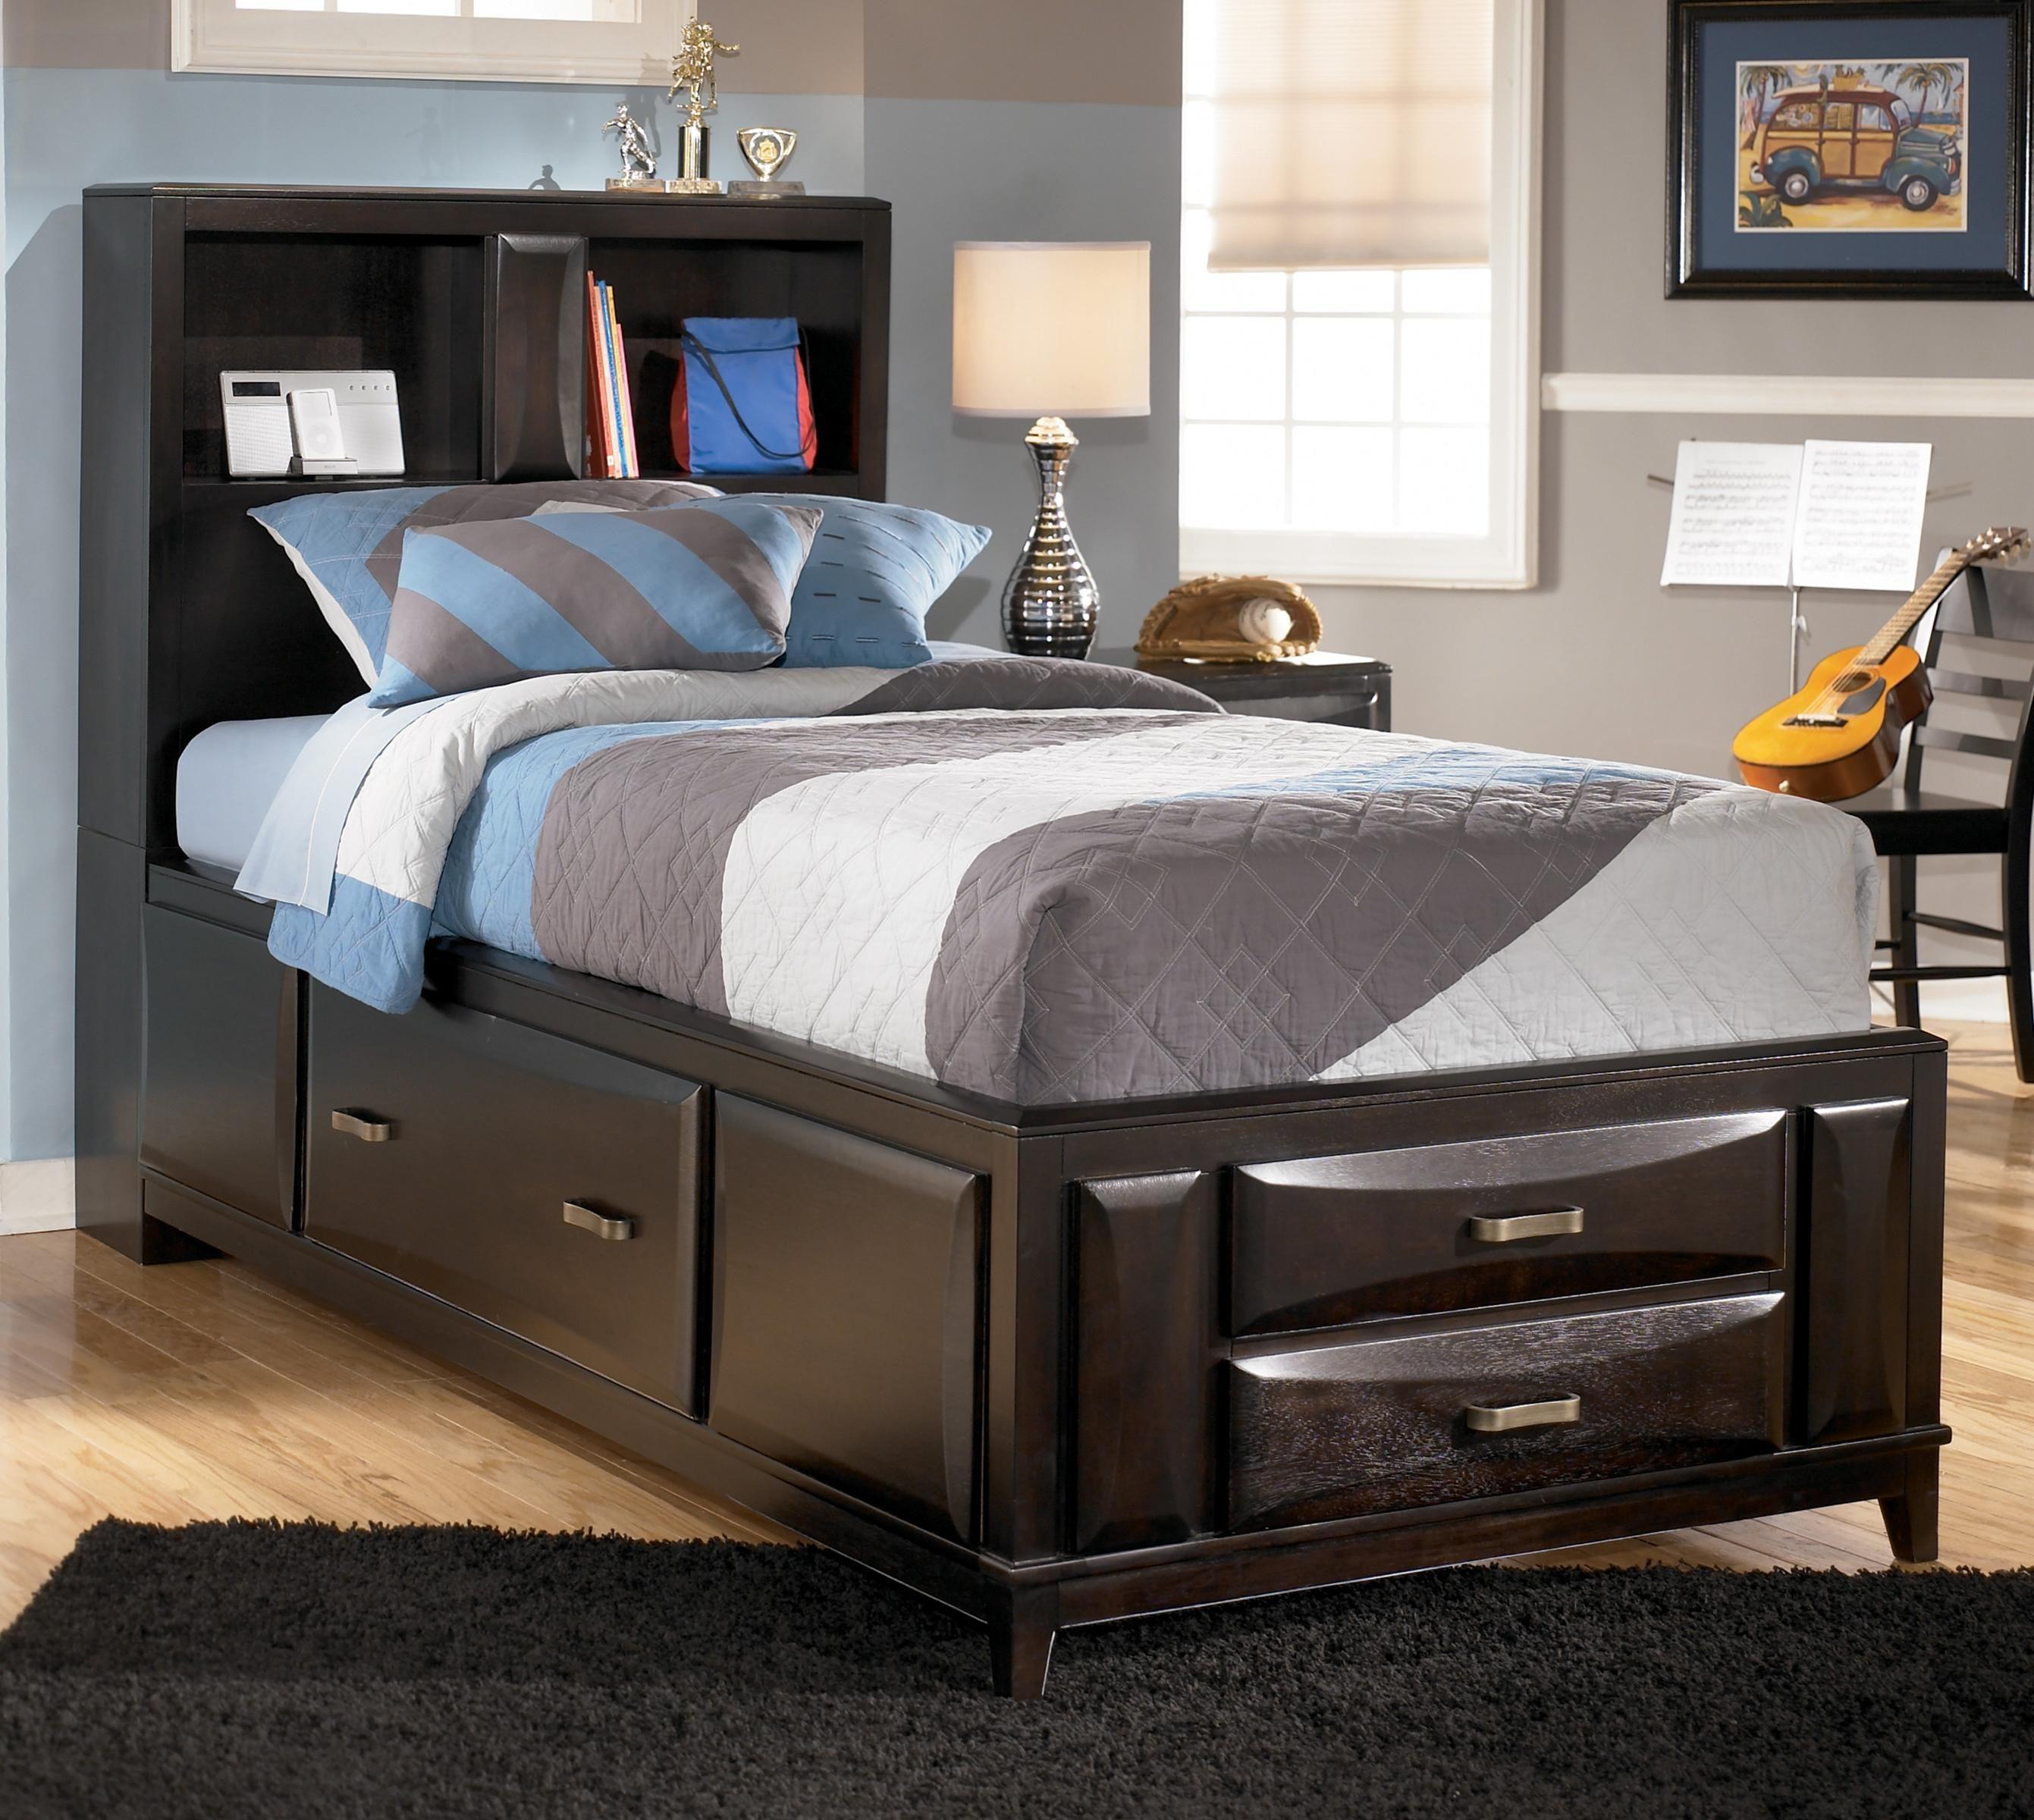 Ashley Twin Bed Headboard Storage